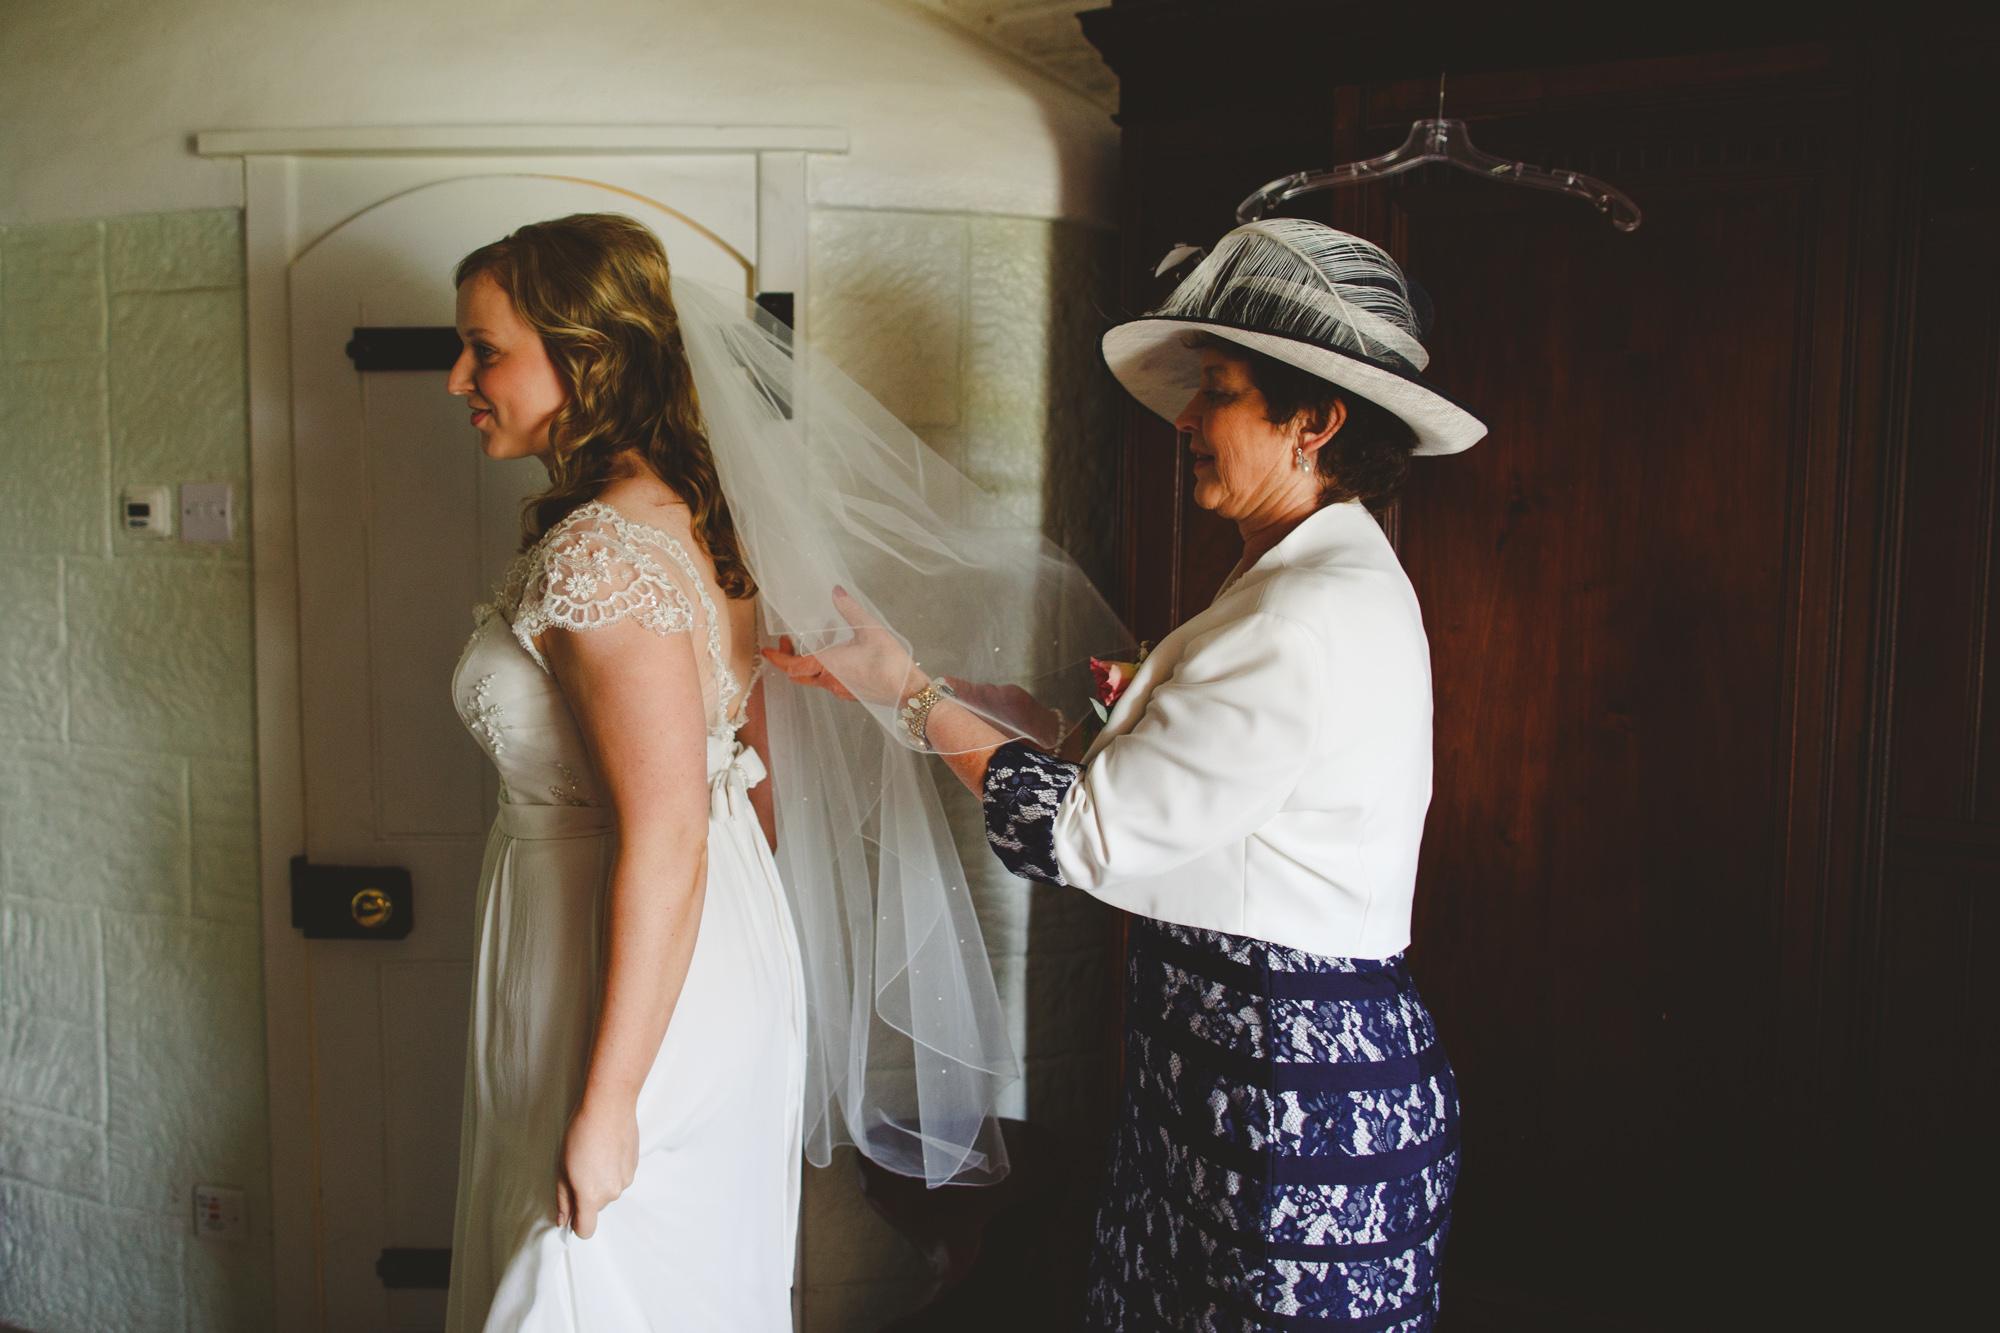 cornwall-alternative-wedding-photographer-beach-wedding-1.jpg